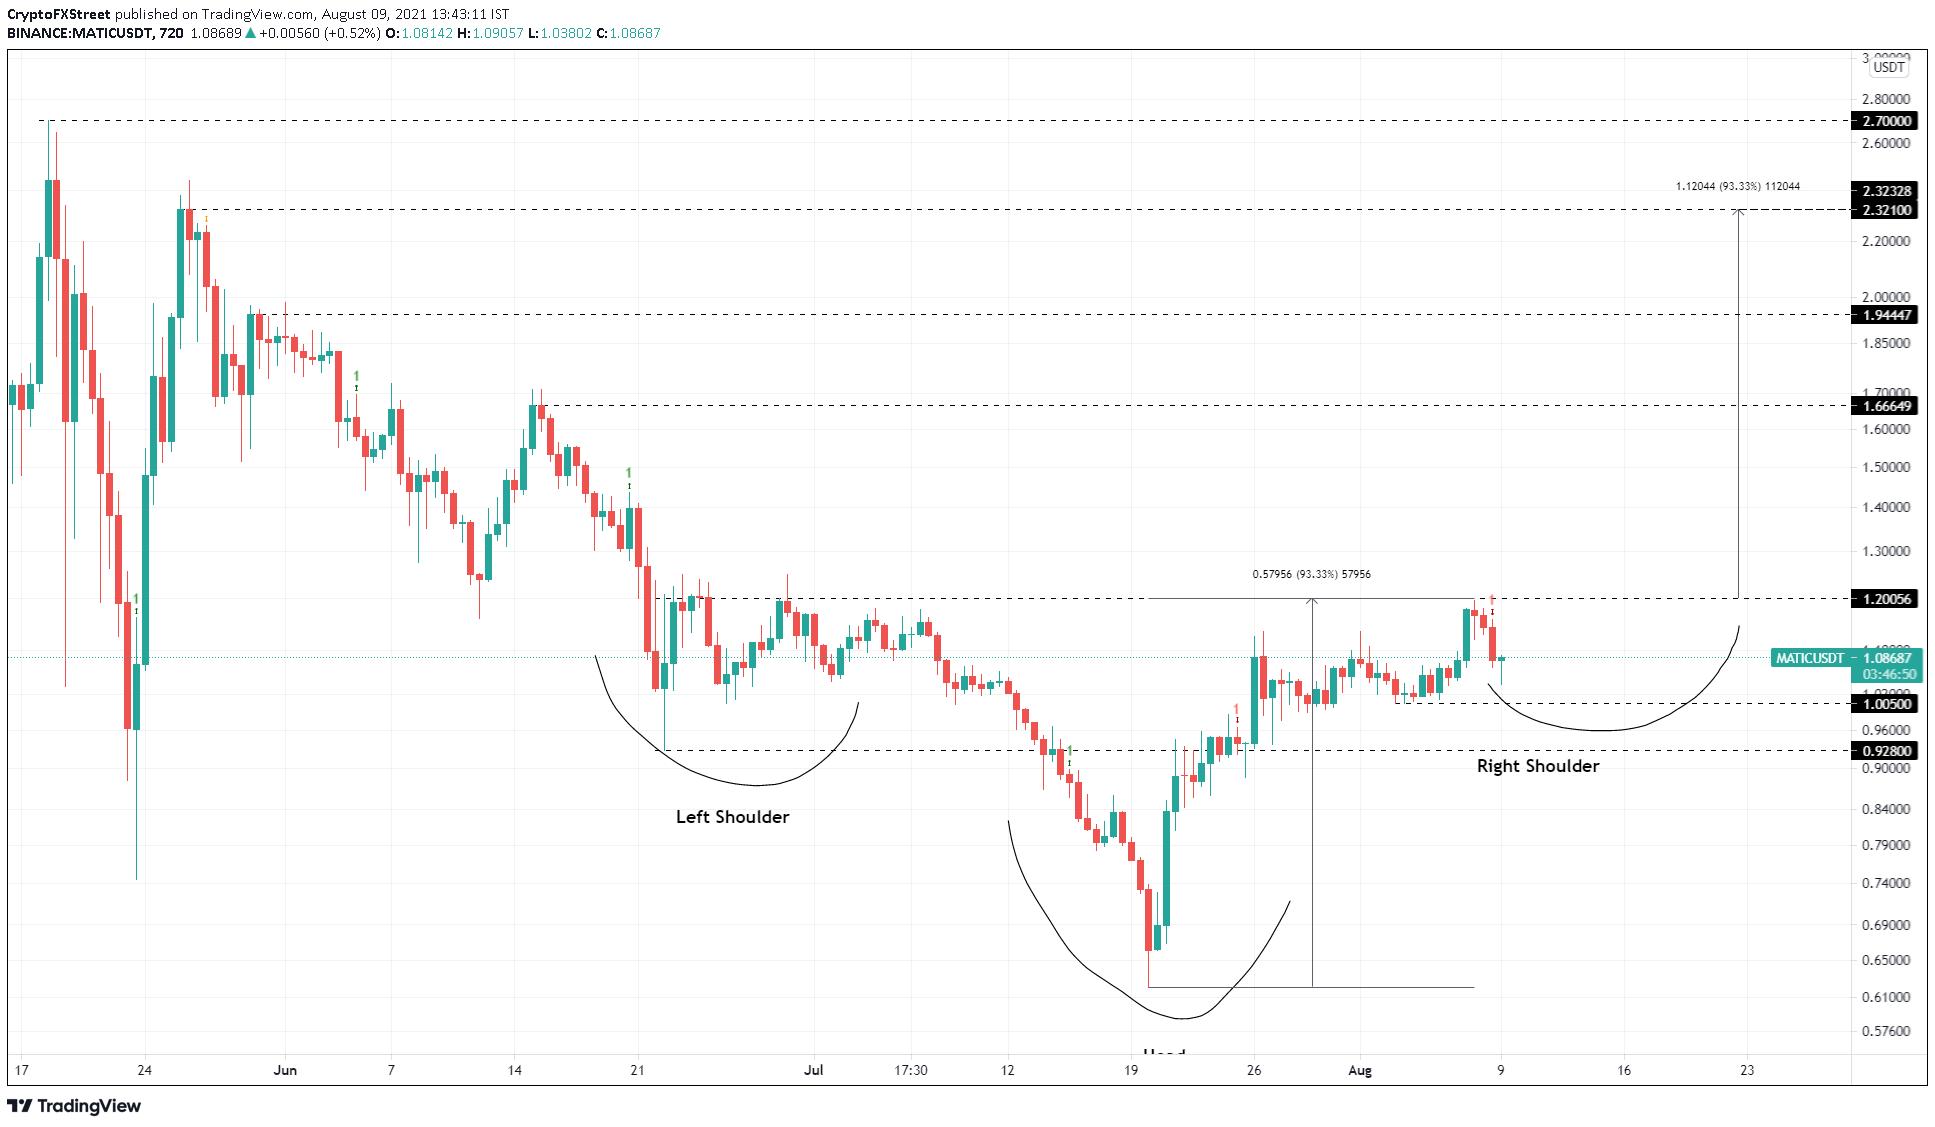 MATIC/USDT 12-hour chart